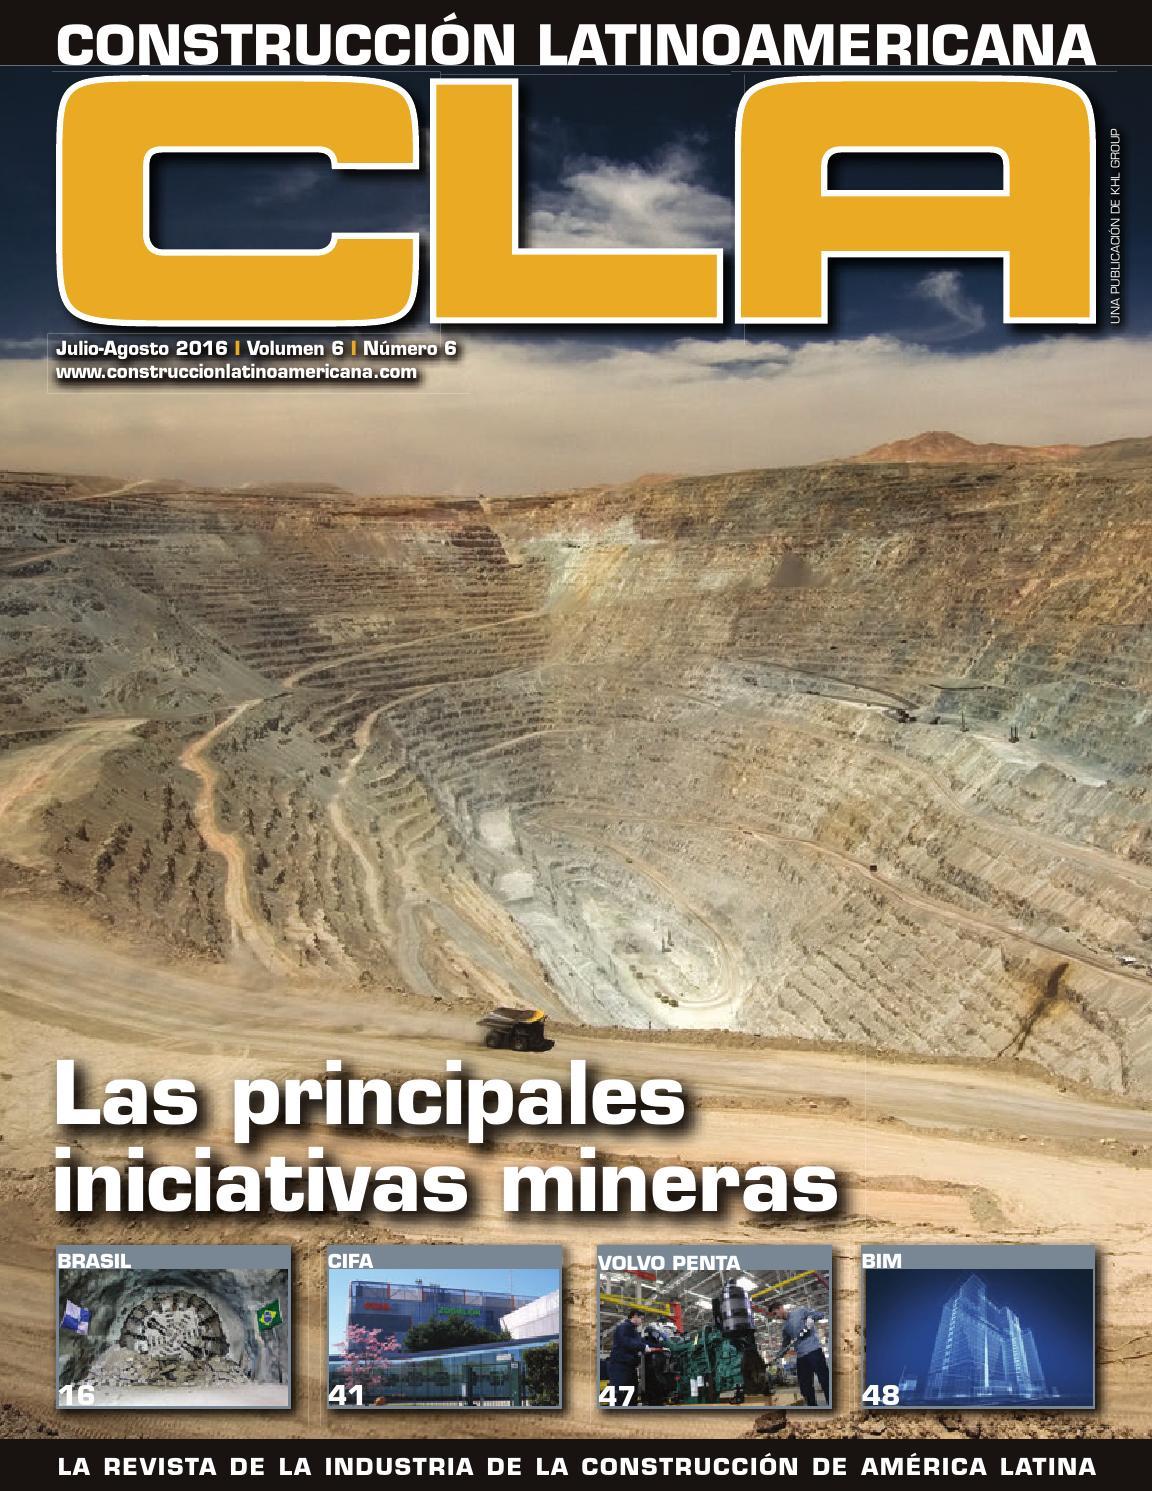 Construcción Latinoamericana Jul-Ago 2016 by Raul M. E. - issuu